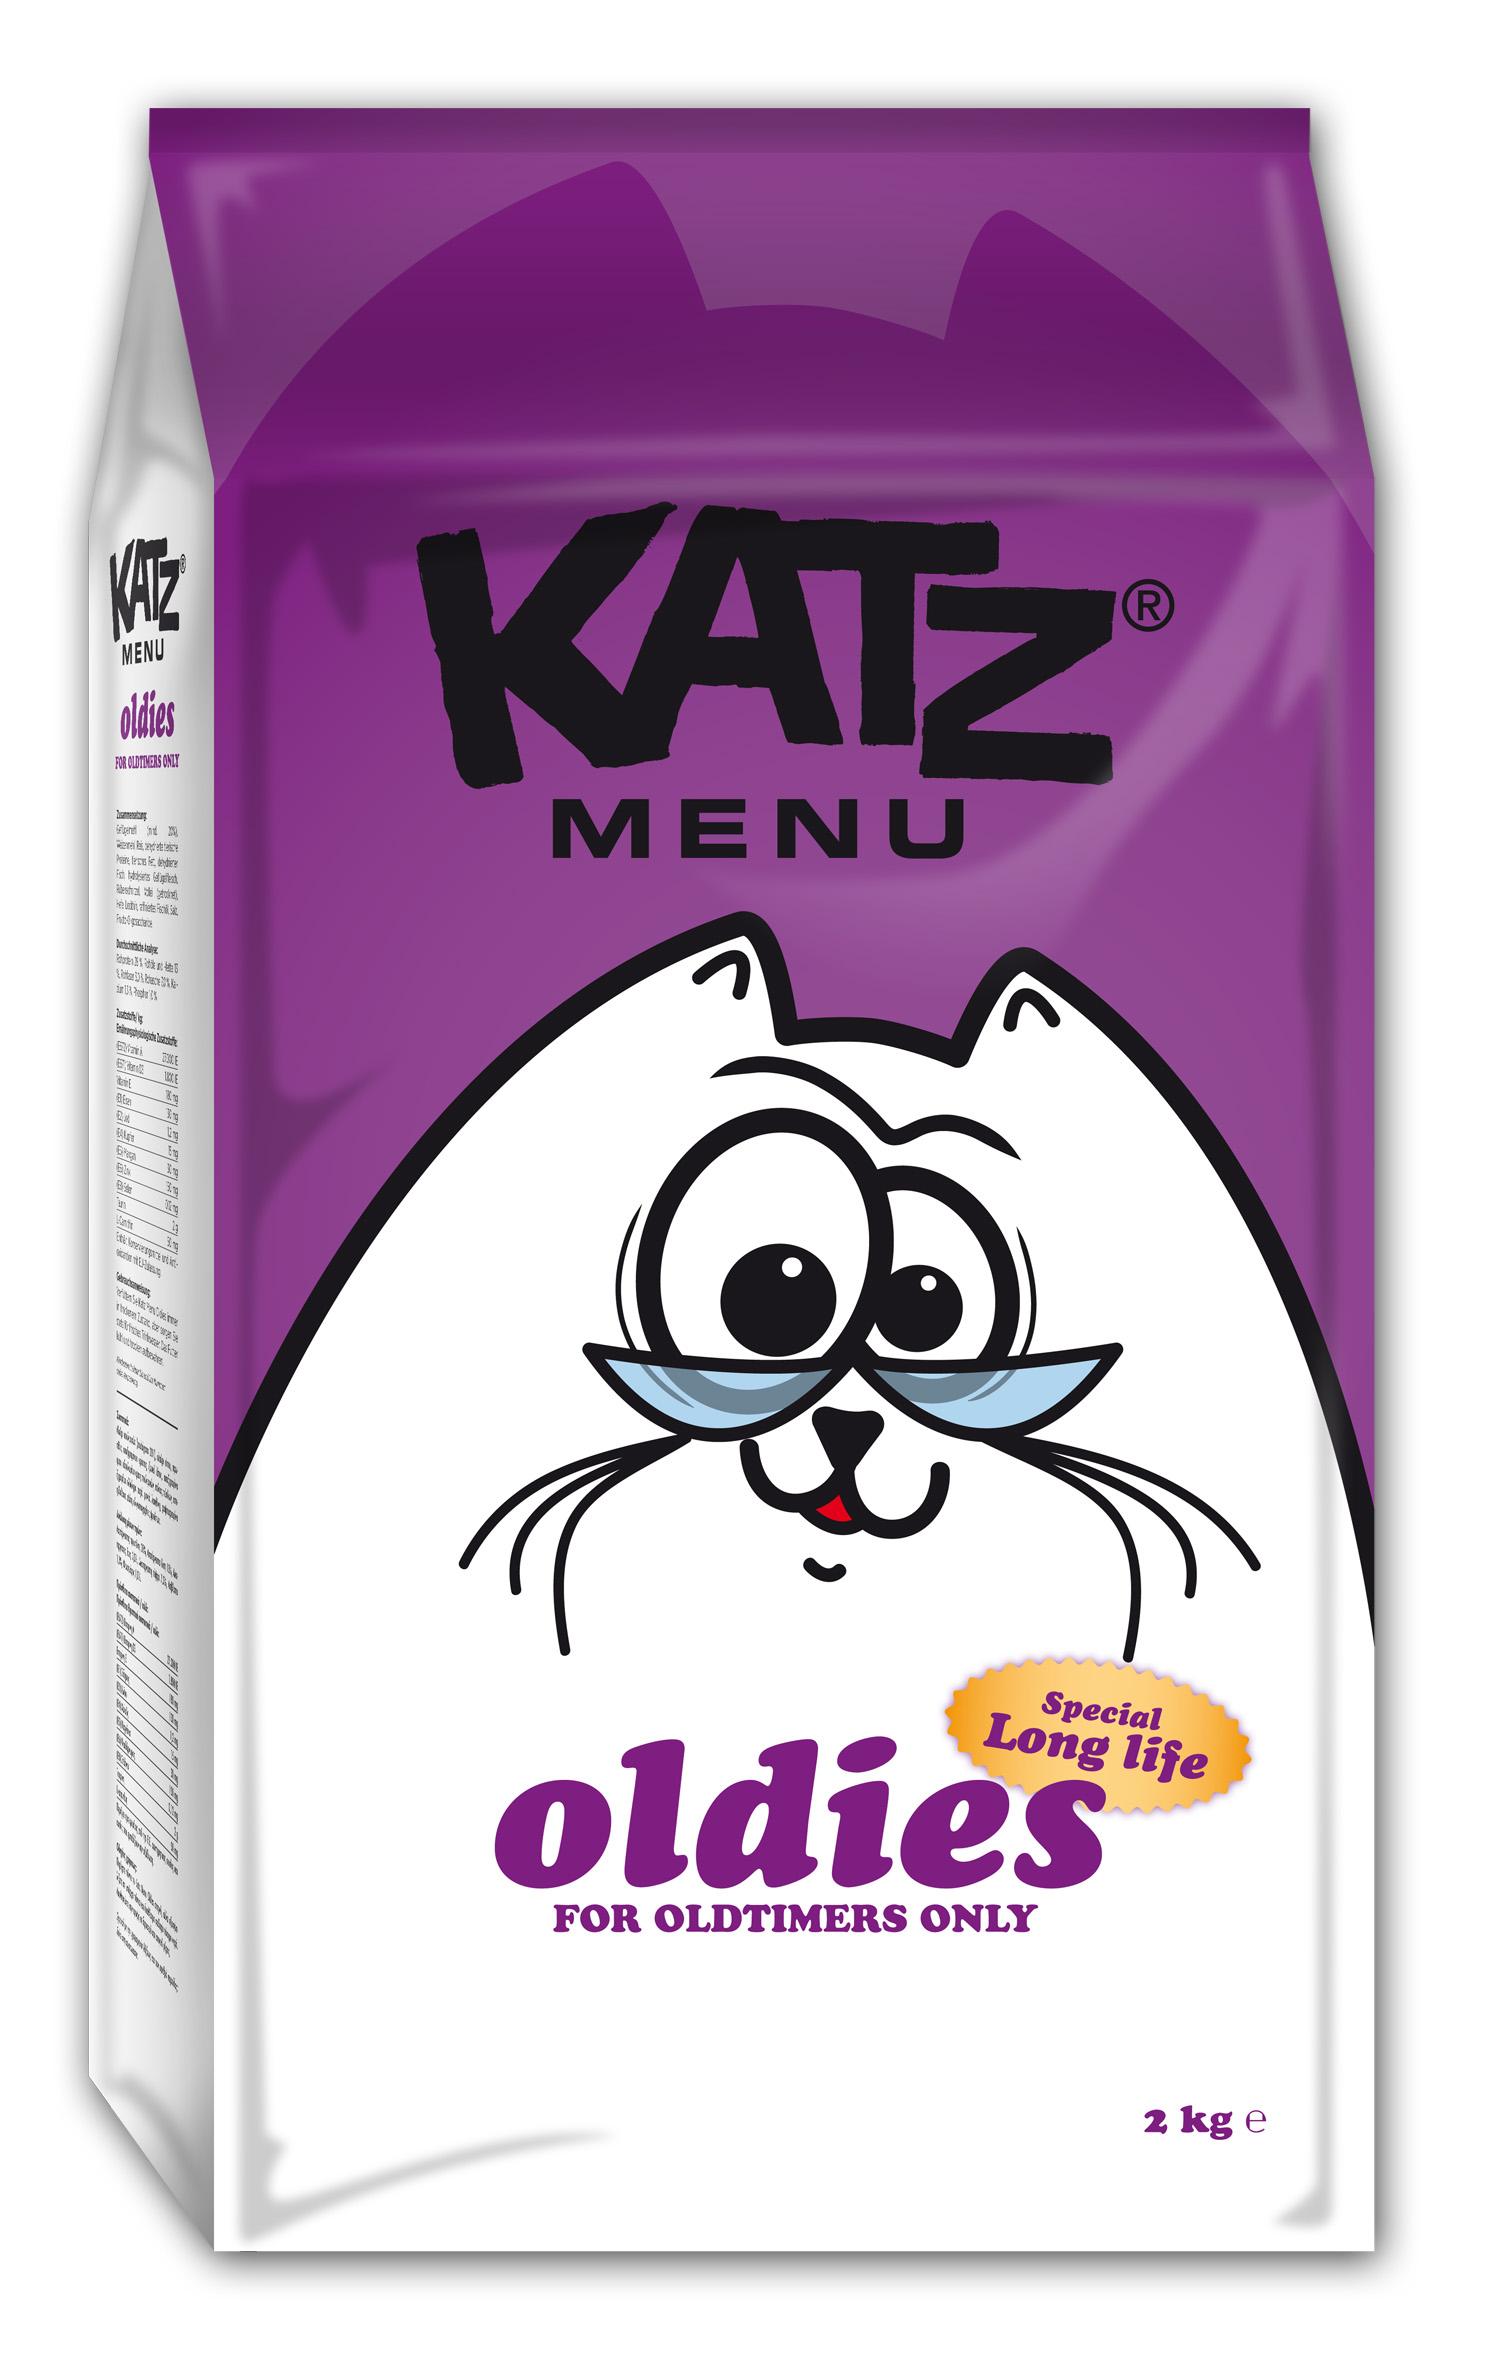 Katz Menu Oldies 2kg